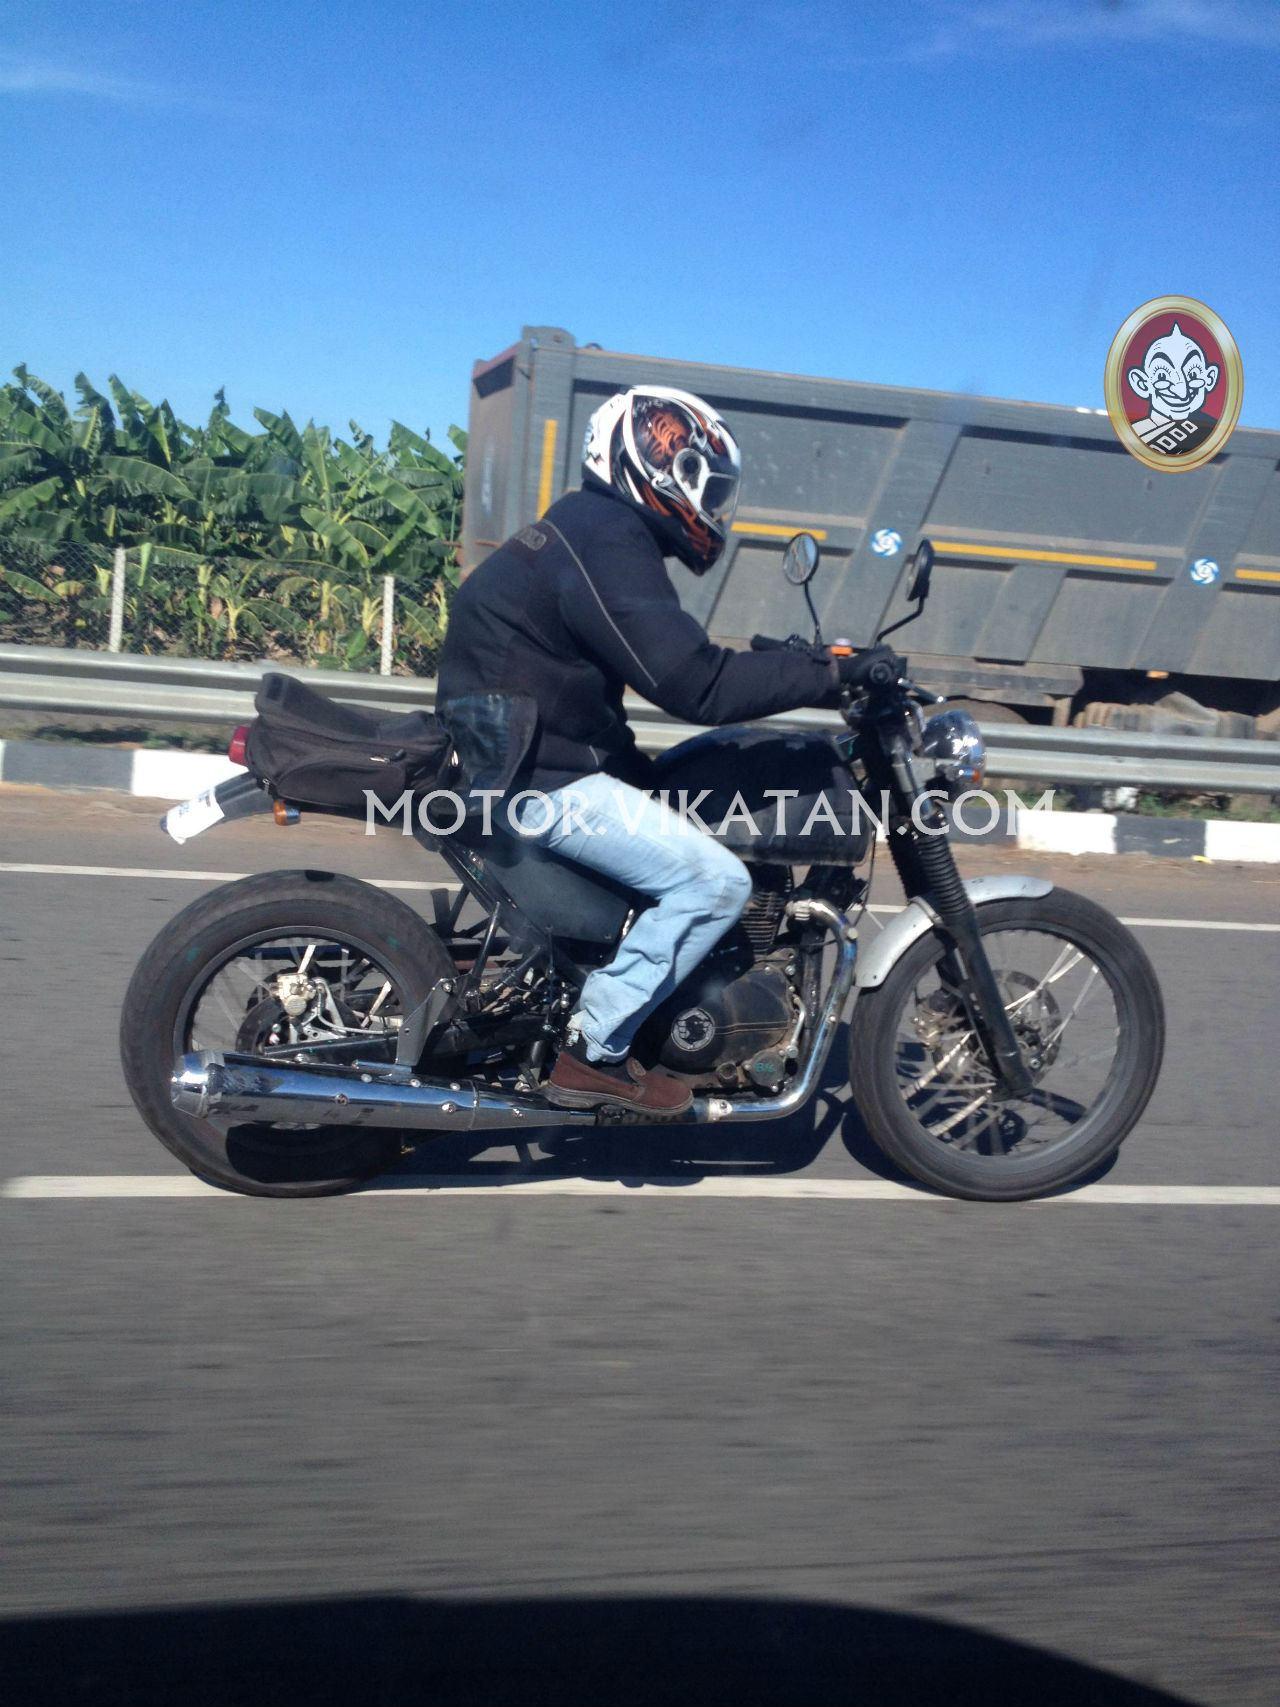 Royal Enfield Himalayan Spotted Testing In Chennai